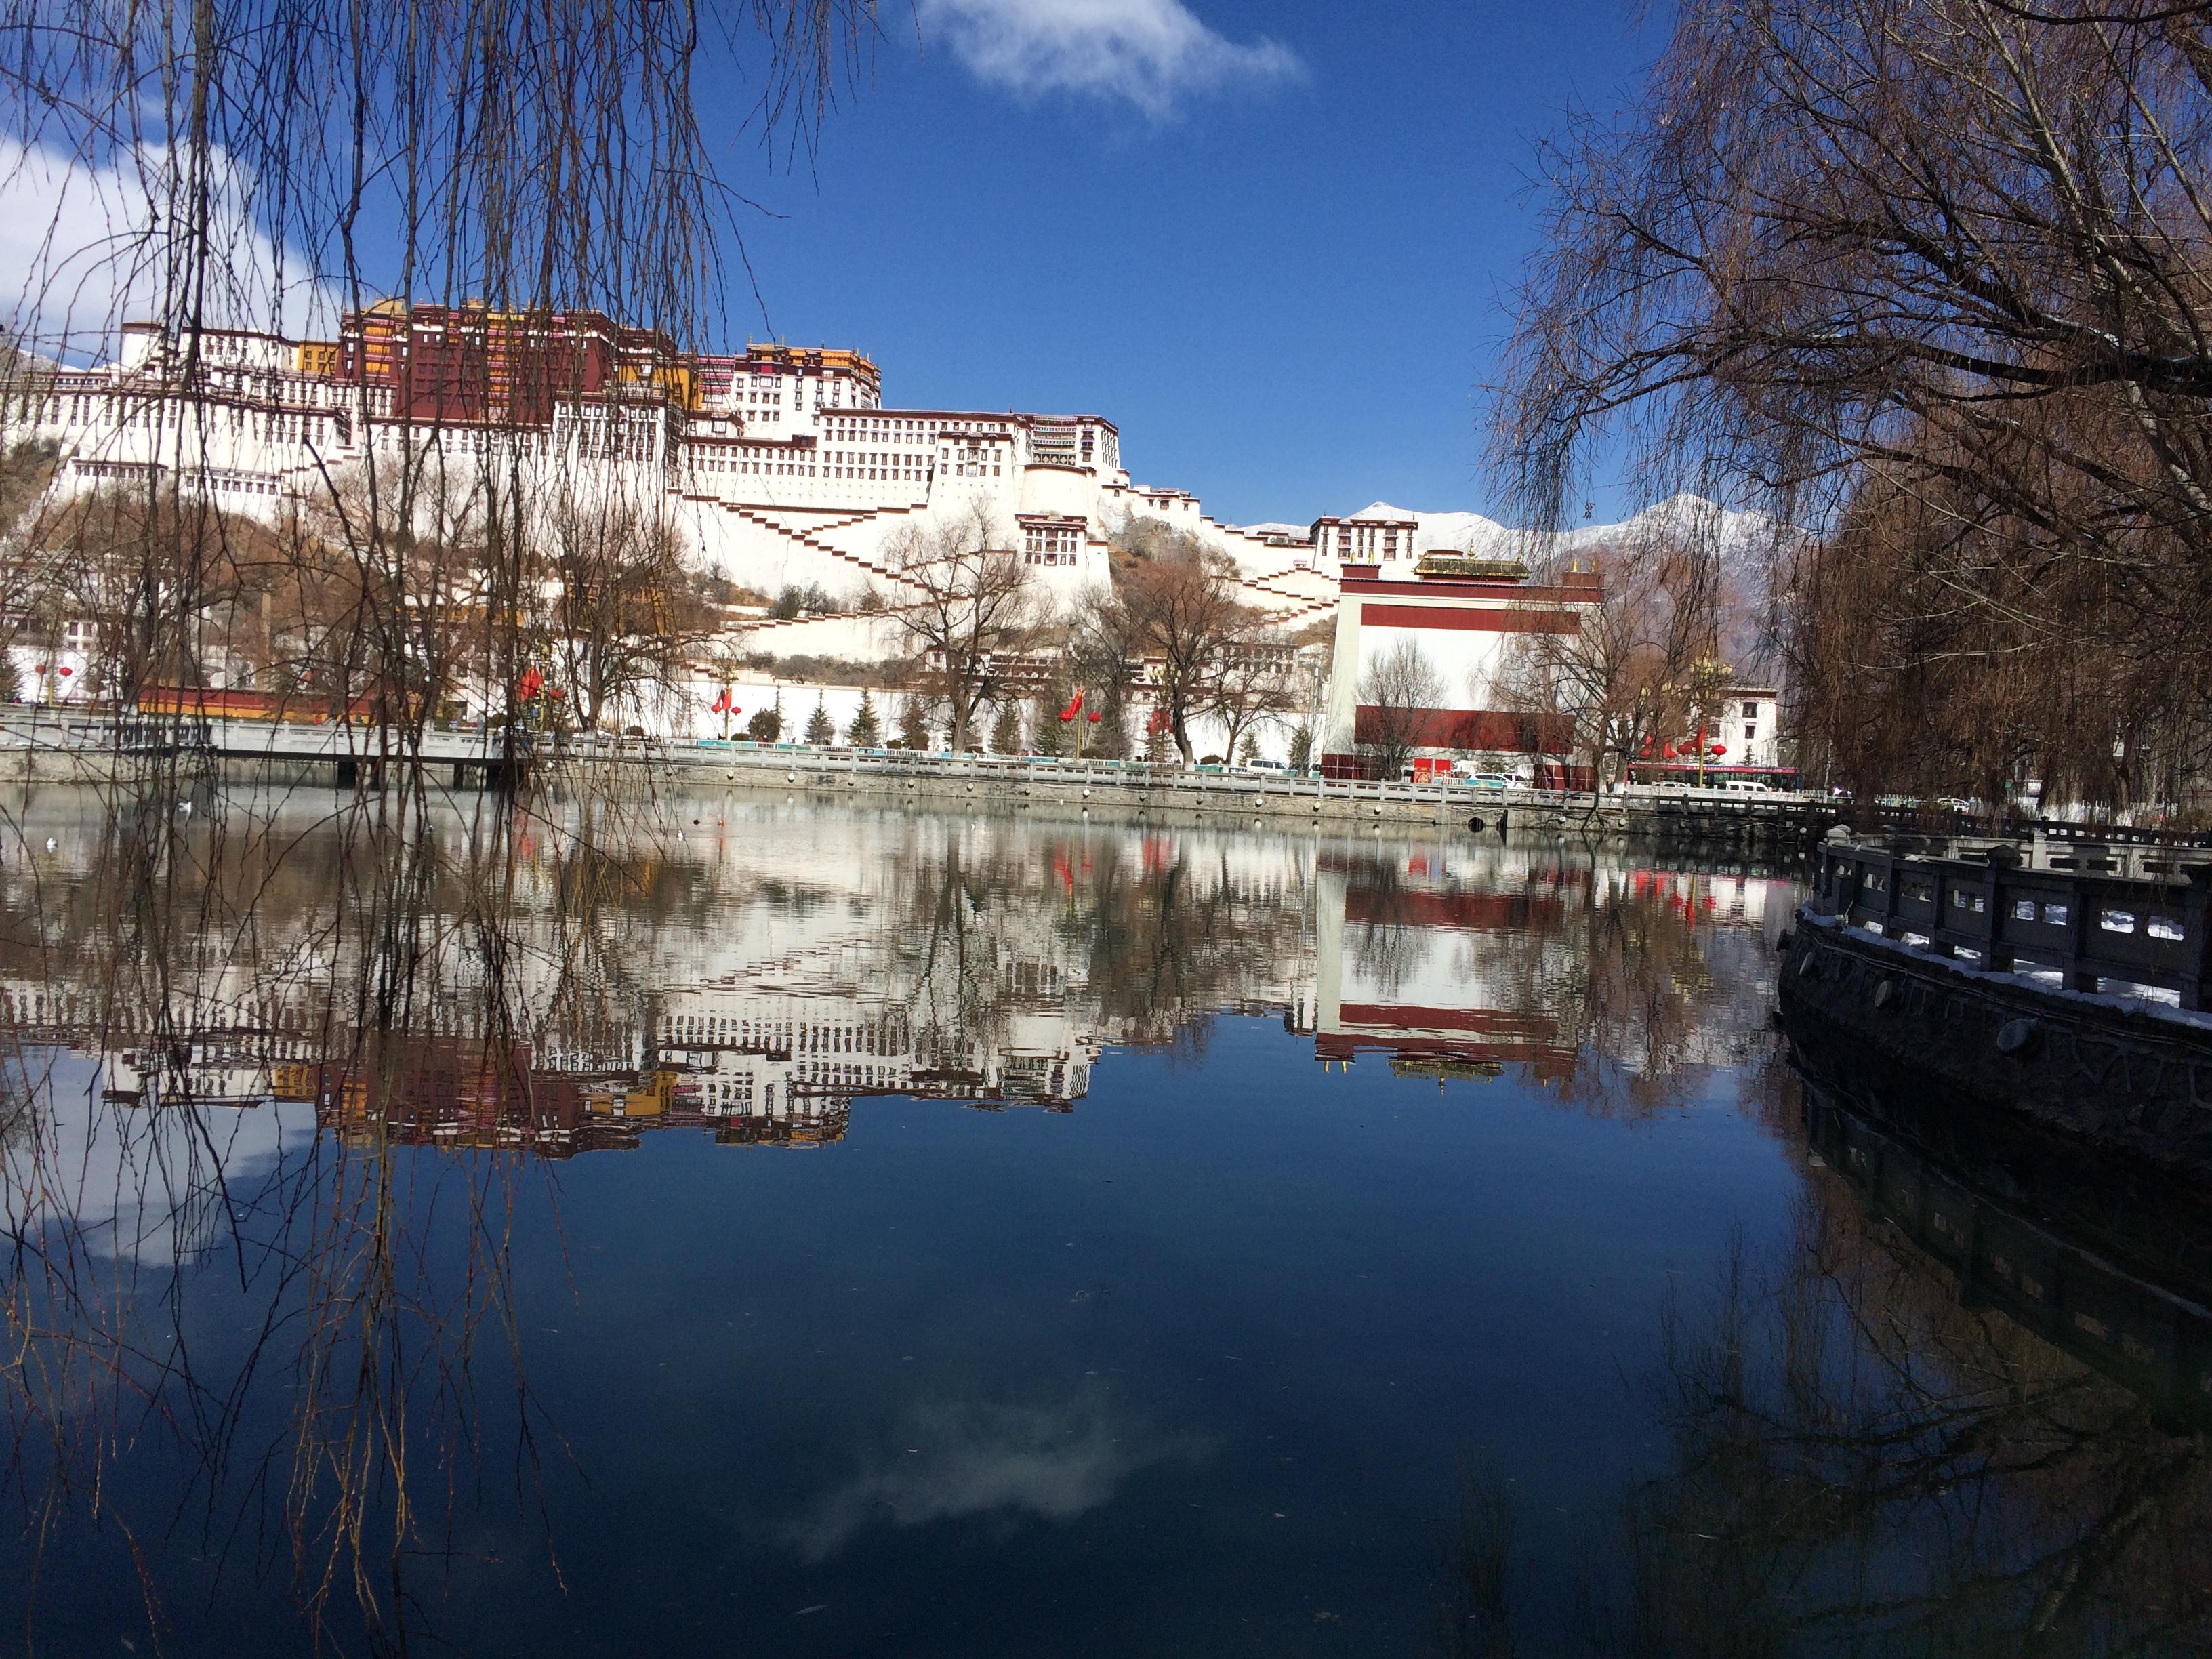 Tibet-China 中國自治區~西藏 Potala Palace - Lhasa布達拉宮~拉薩, Outdoor, Water, Waterfront, HQ Photo